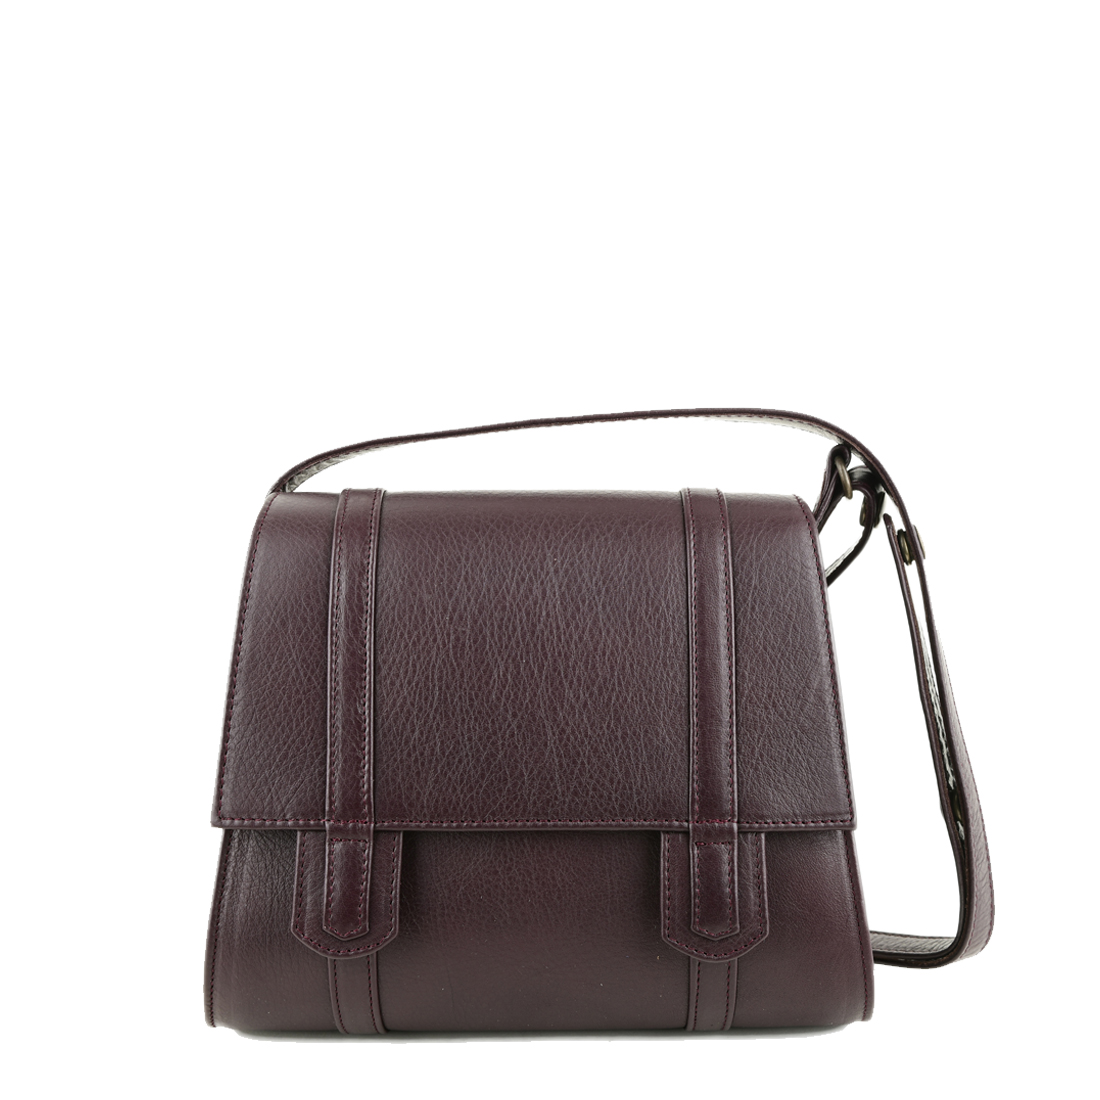 Chloe Plum Across Body Leather Bag